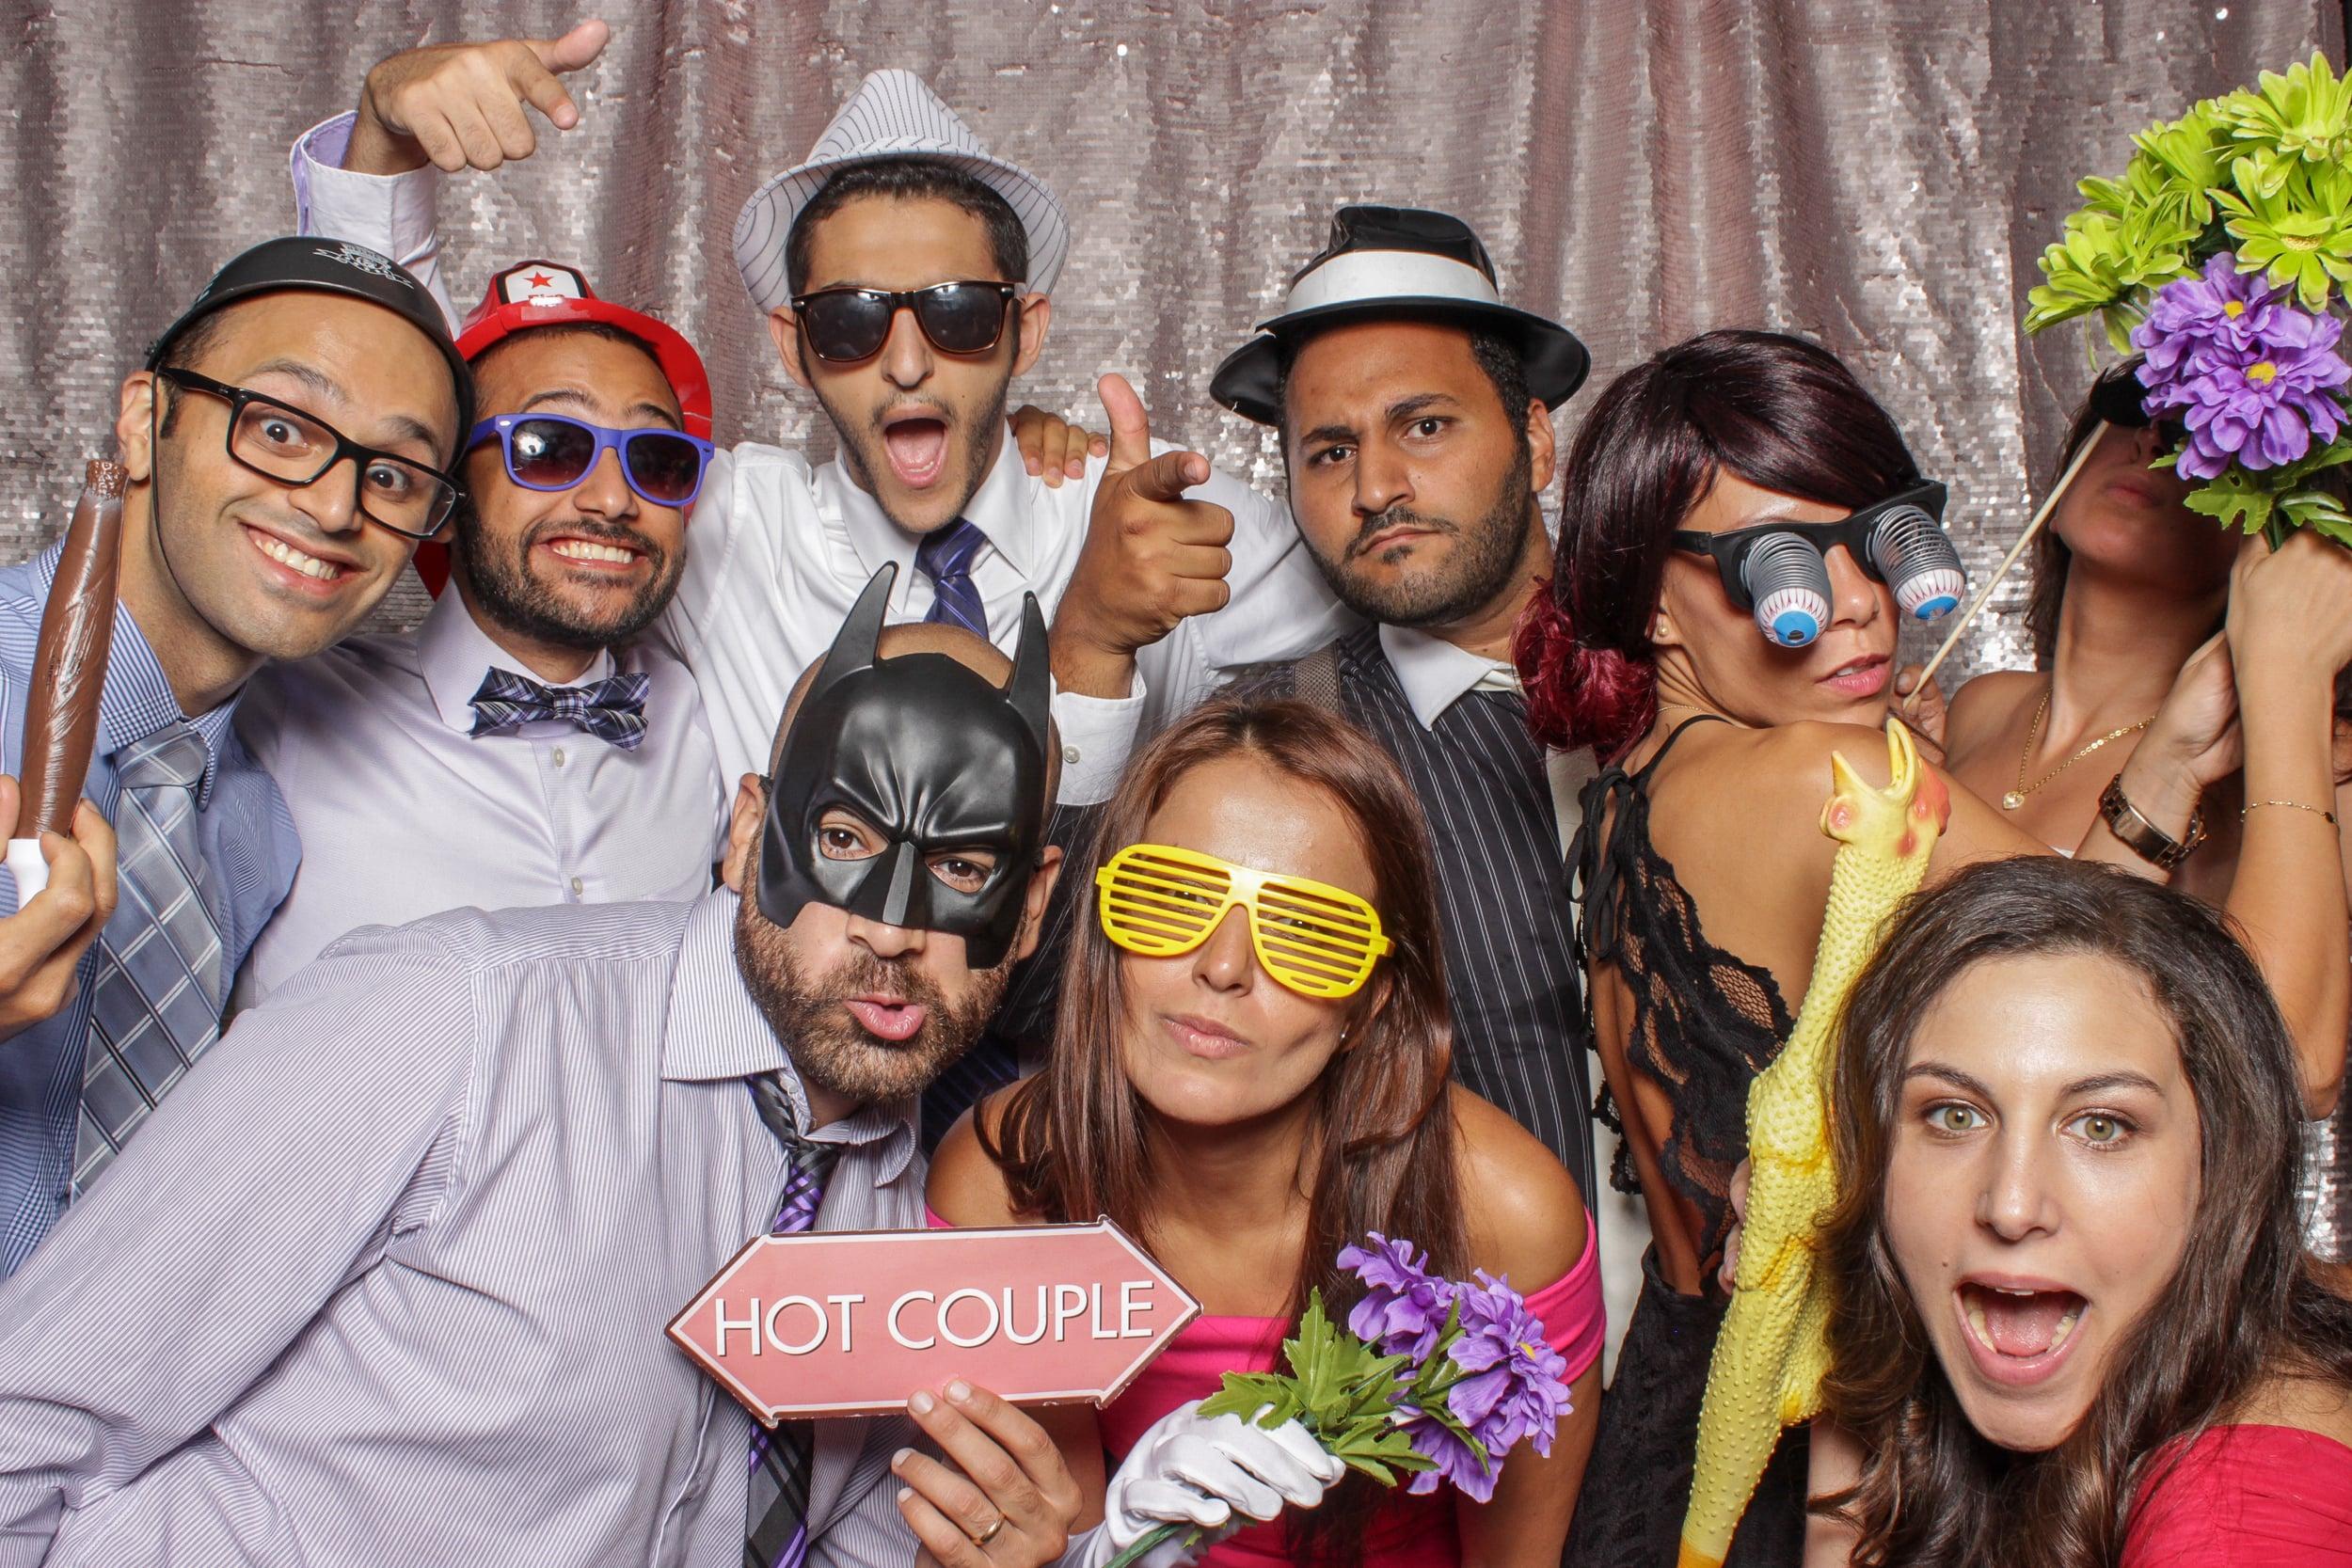 ottawa-wedding-photobooth-44.JPG